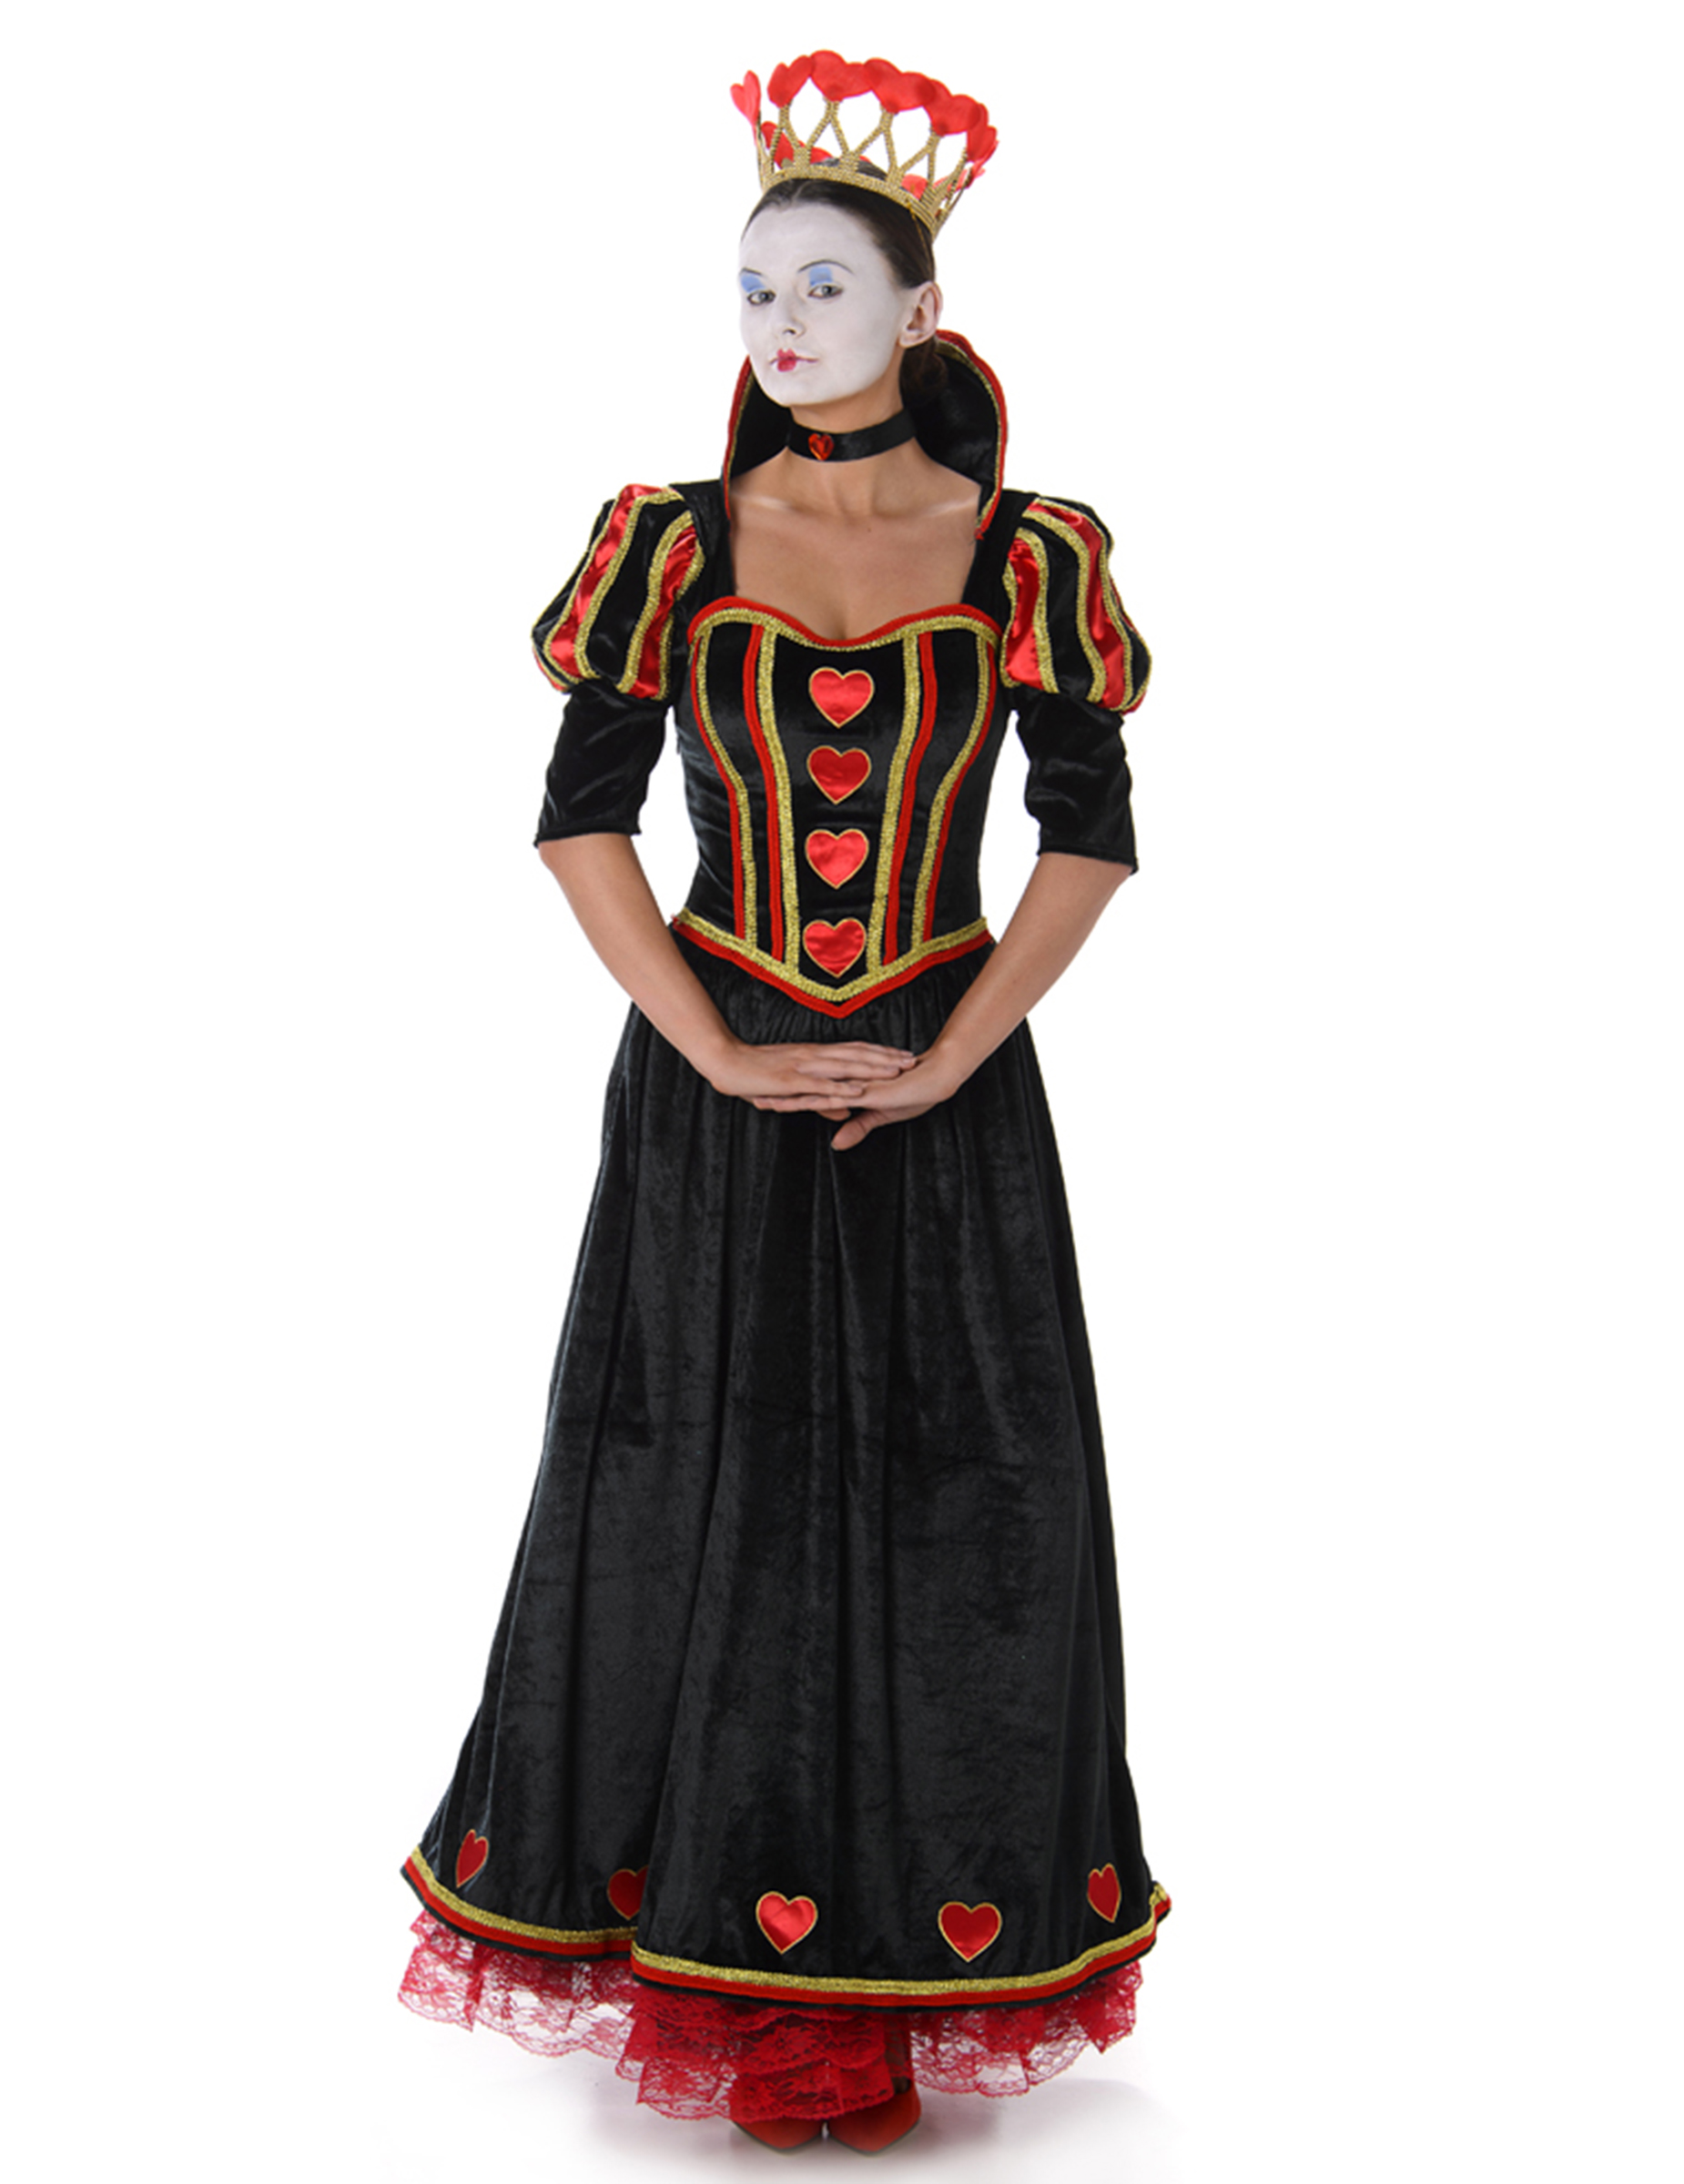 Nerocostumi Regina Vestiti In Mpzqsguv Adulti E Cuori Donna Costume Di 8XwPkn0O